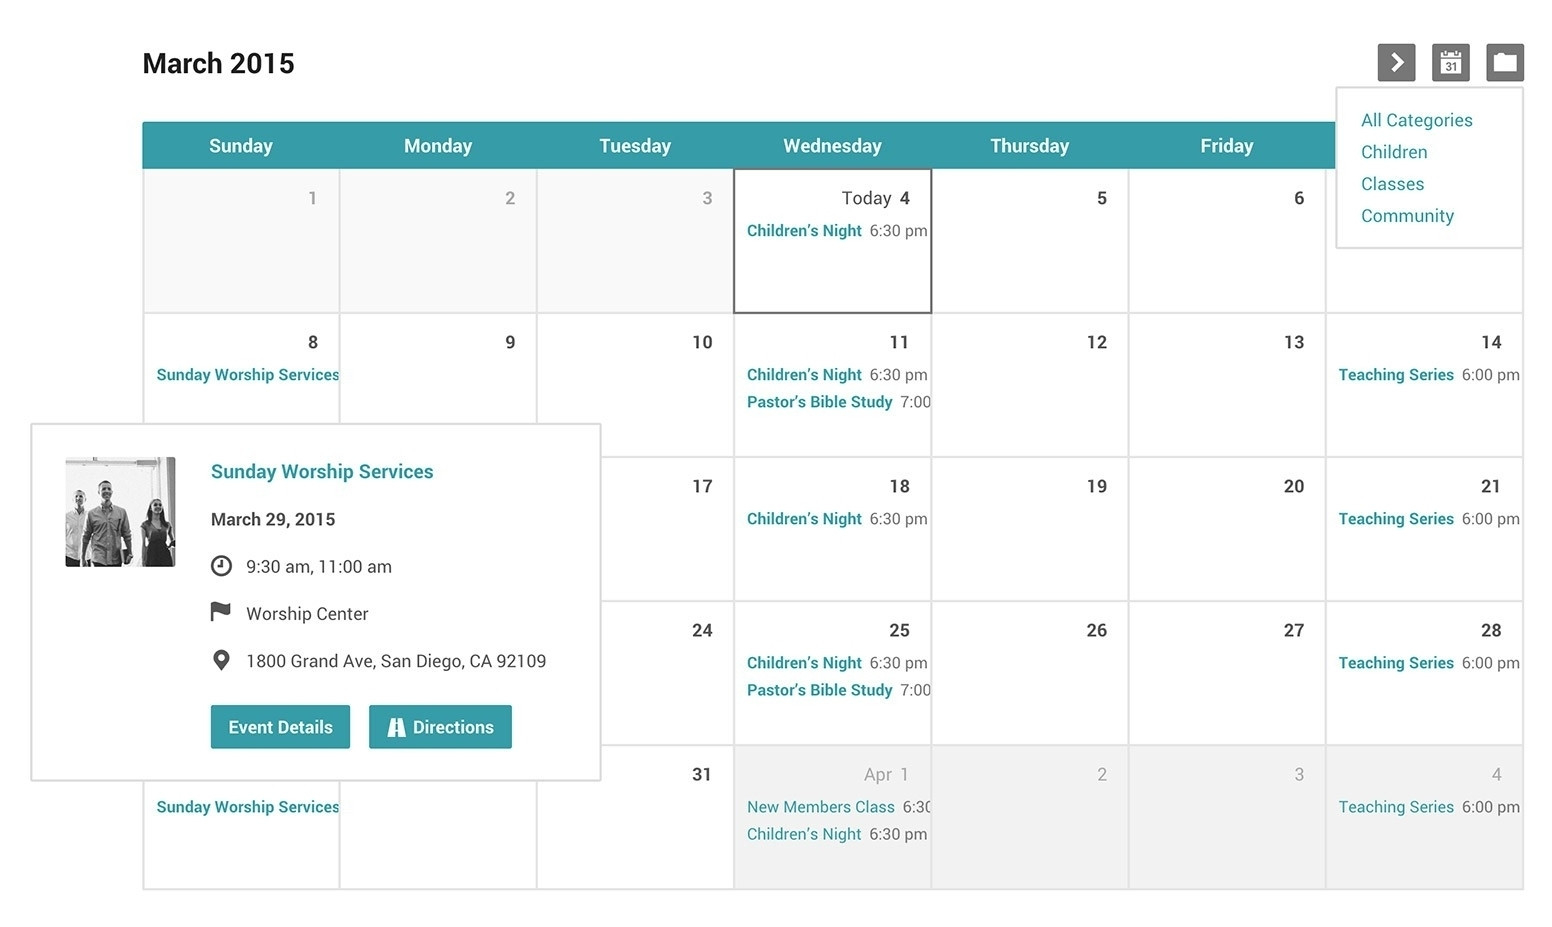 Depo Perpetual Calendar 2021 | Printable Calendar Template  Depo Injection Schedule 2021